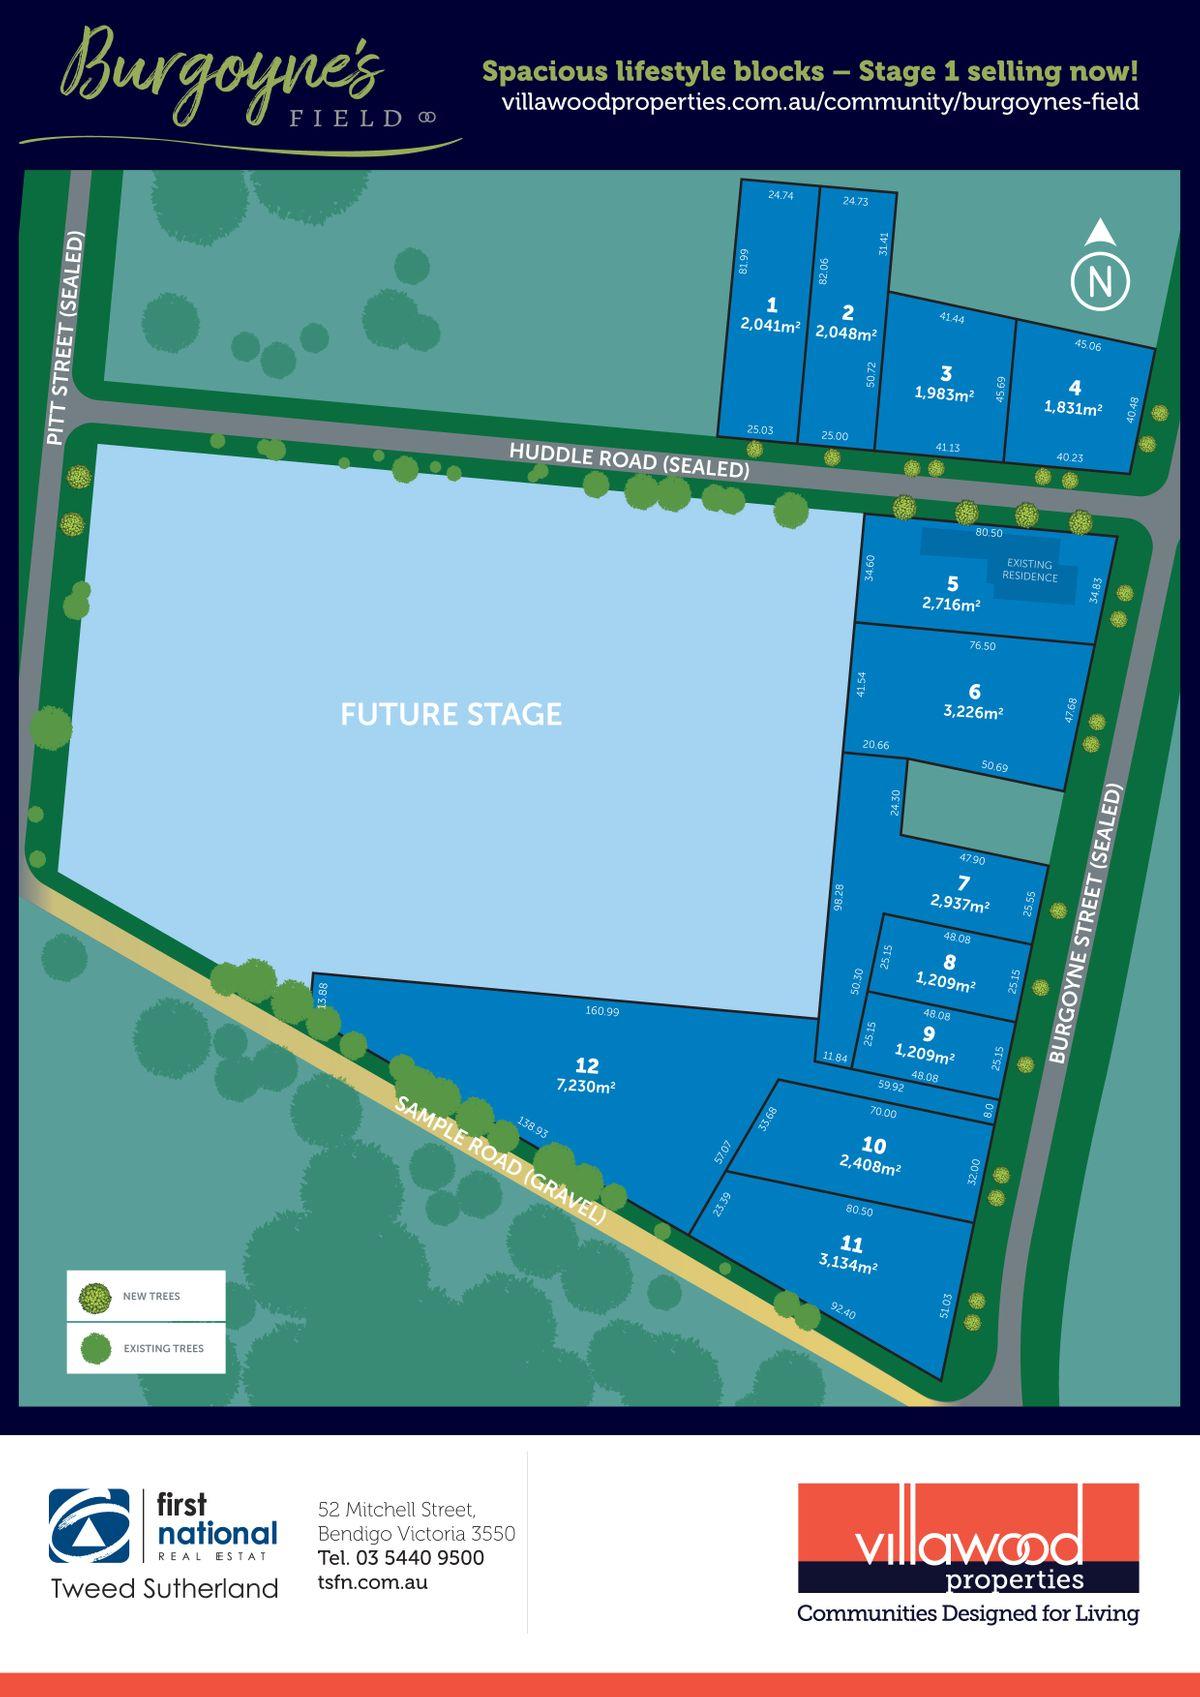 Stage 1  Burgoynes Field Estate, Huntly, VIC 3551